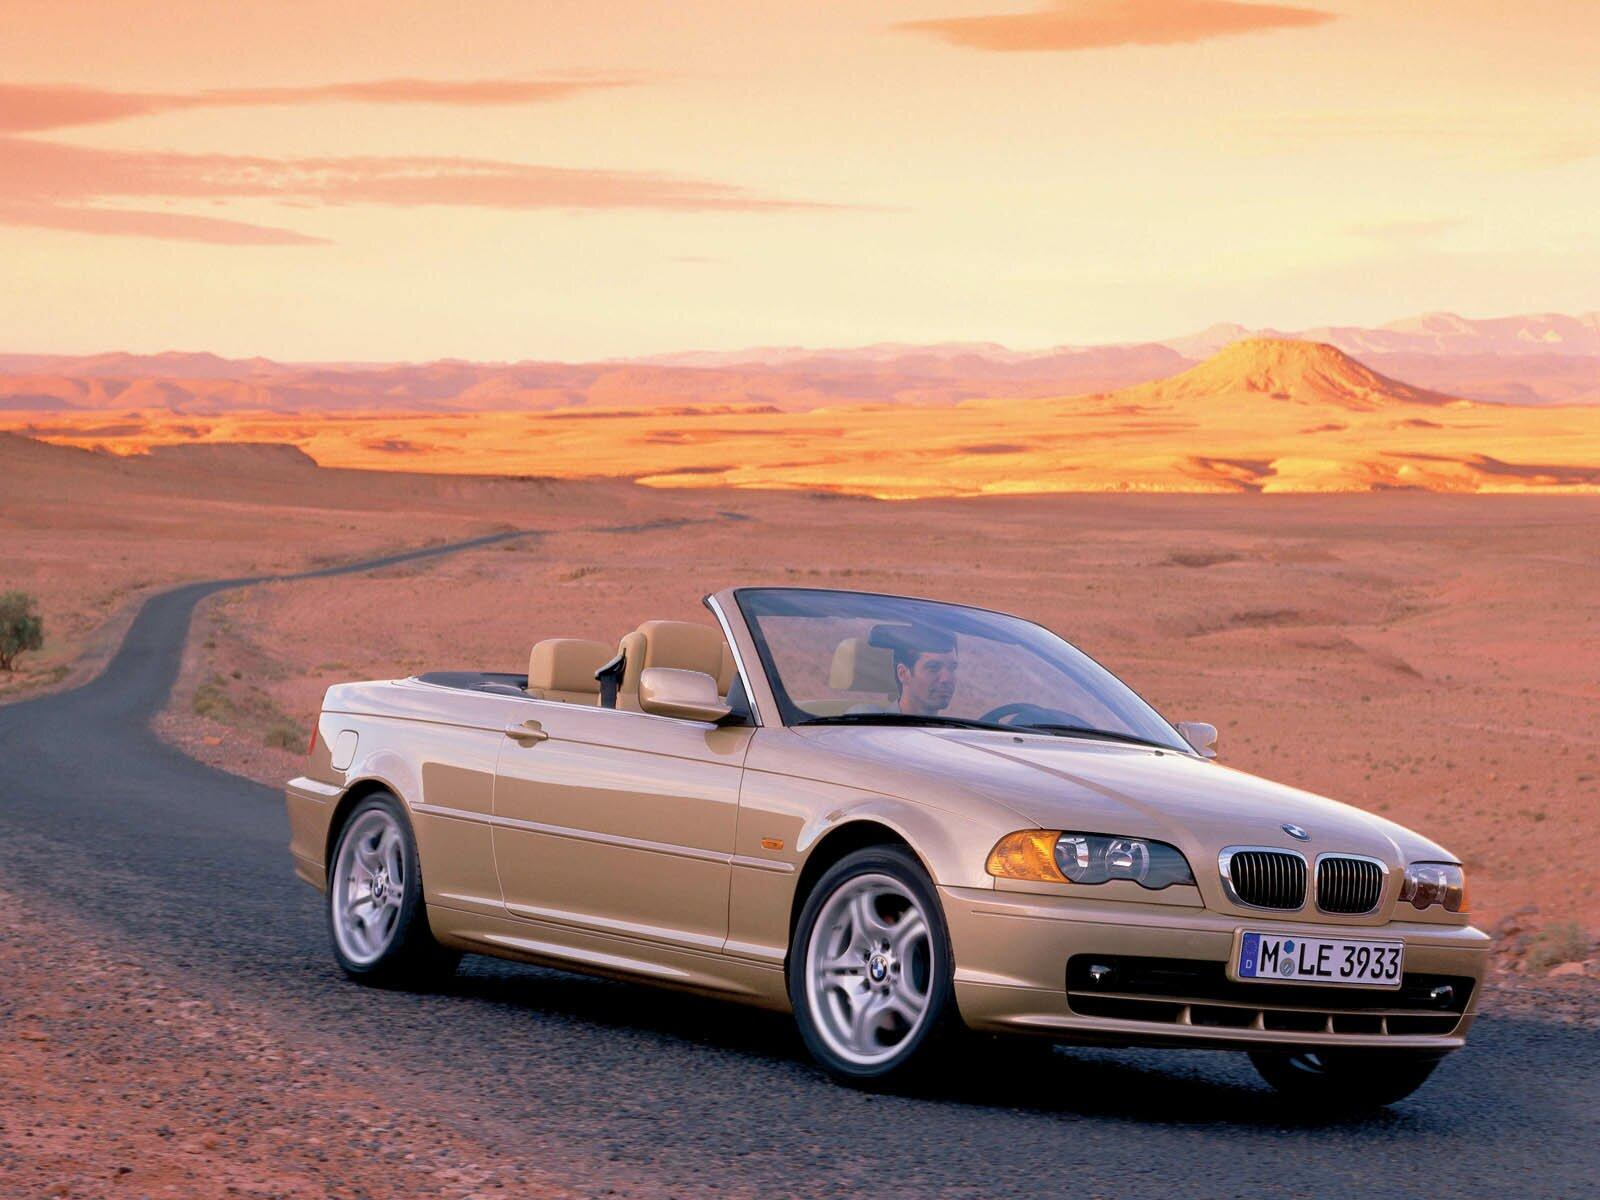 BMW 3series E46 Convertible photos  Photo Gallery Page 2